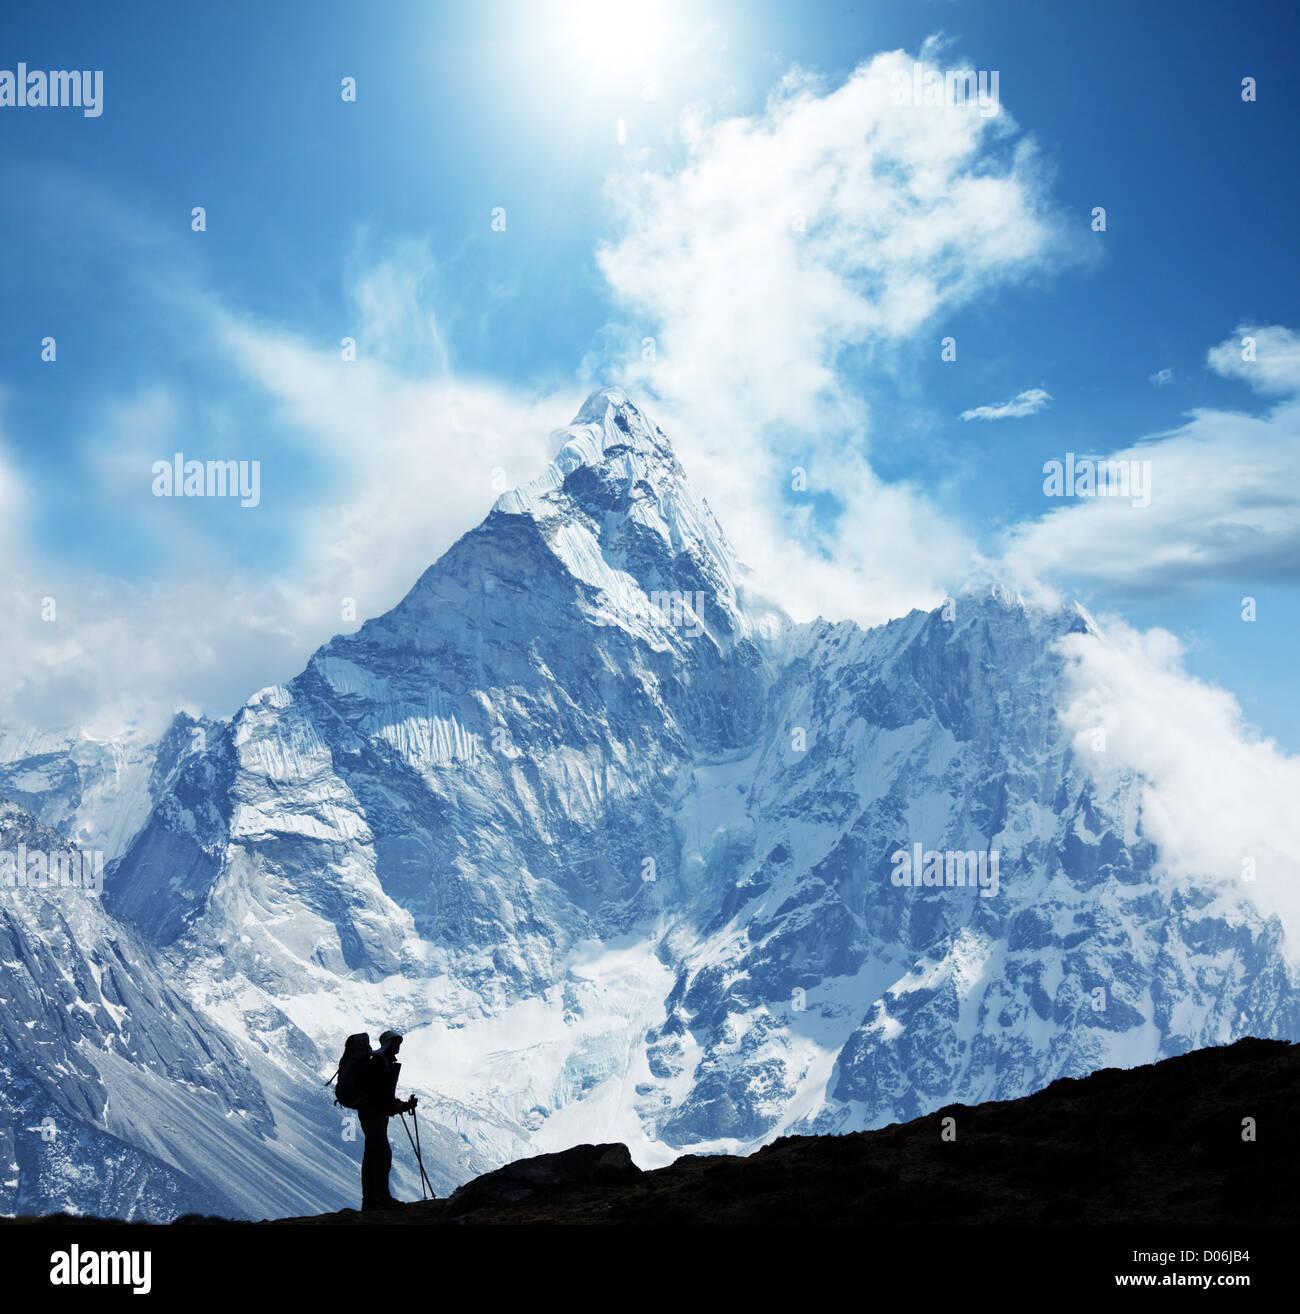 Scalatore in montagna himalayana Immagini Stock